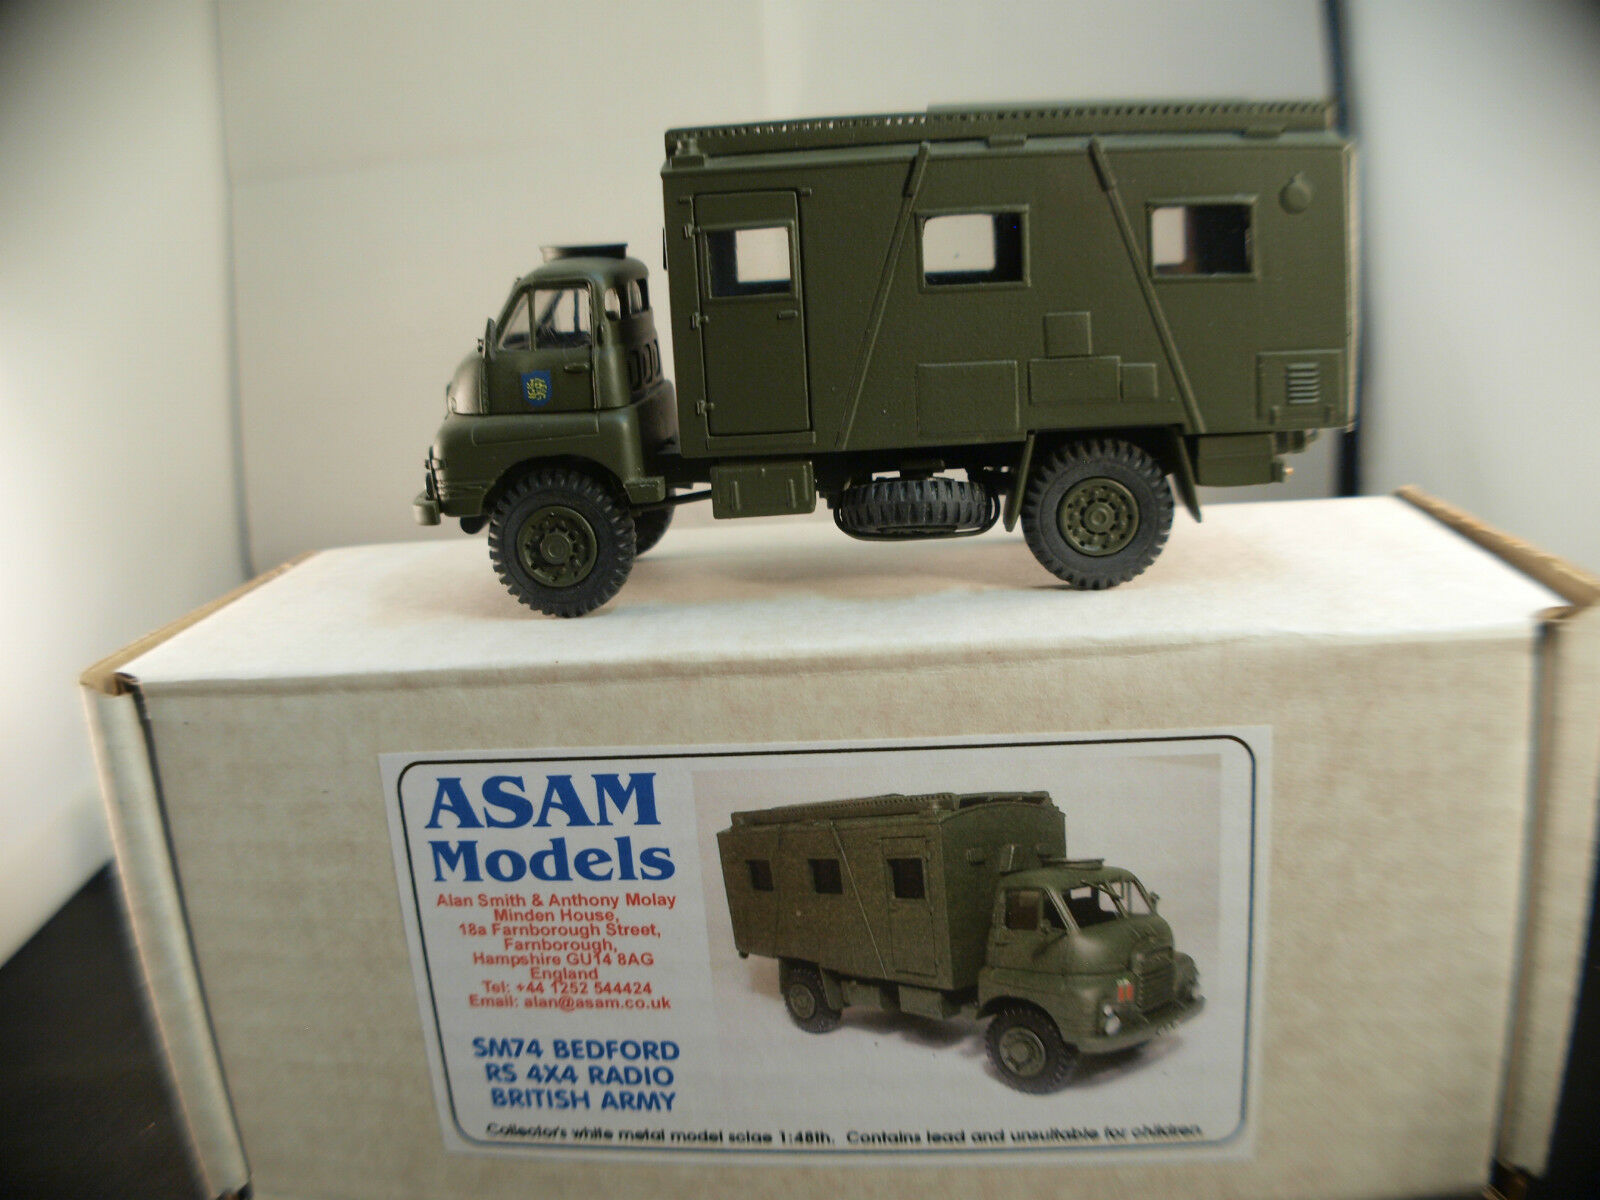 Asam models sm74 bedford rs 4x4 radio army of the british army new mint mib